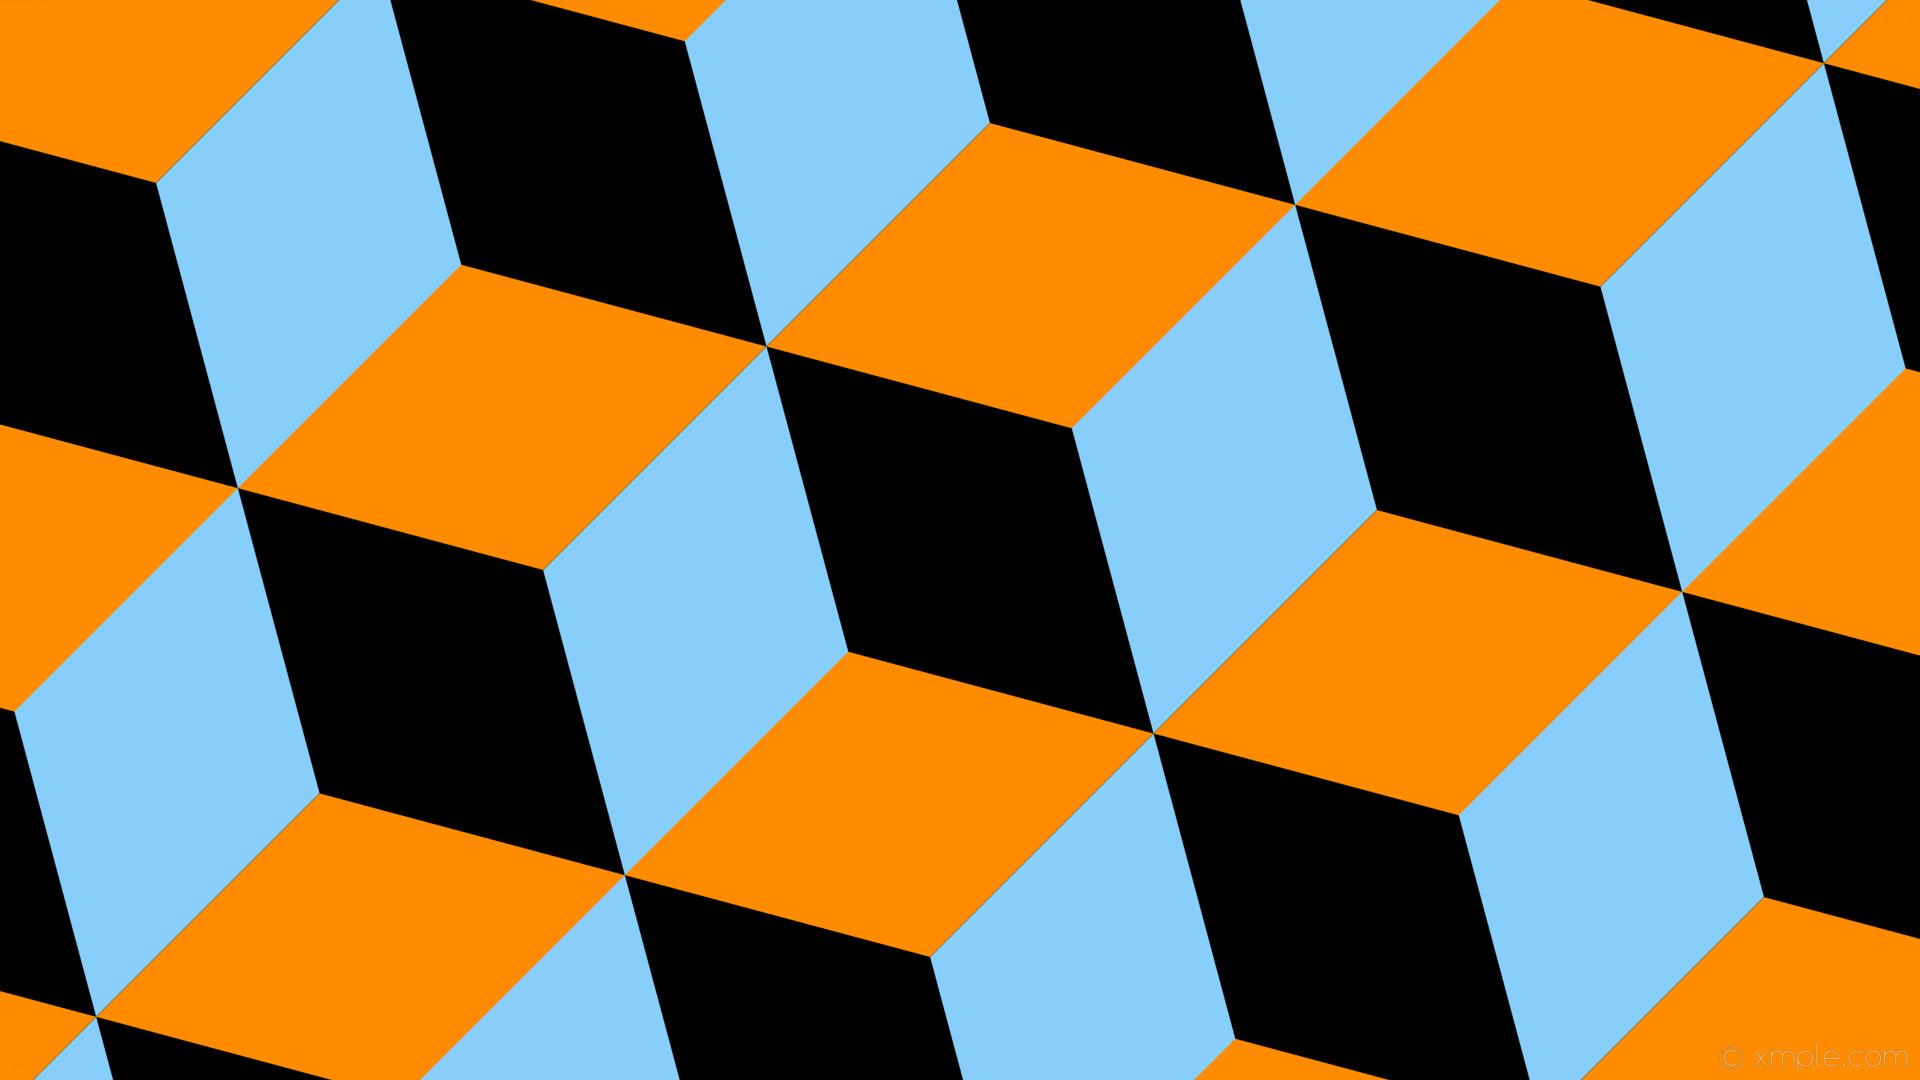 wallpaper blue 3d cubes orange black light sky blue dark orange #000000  #87cefa #